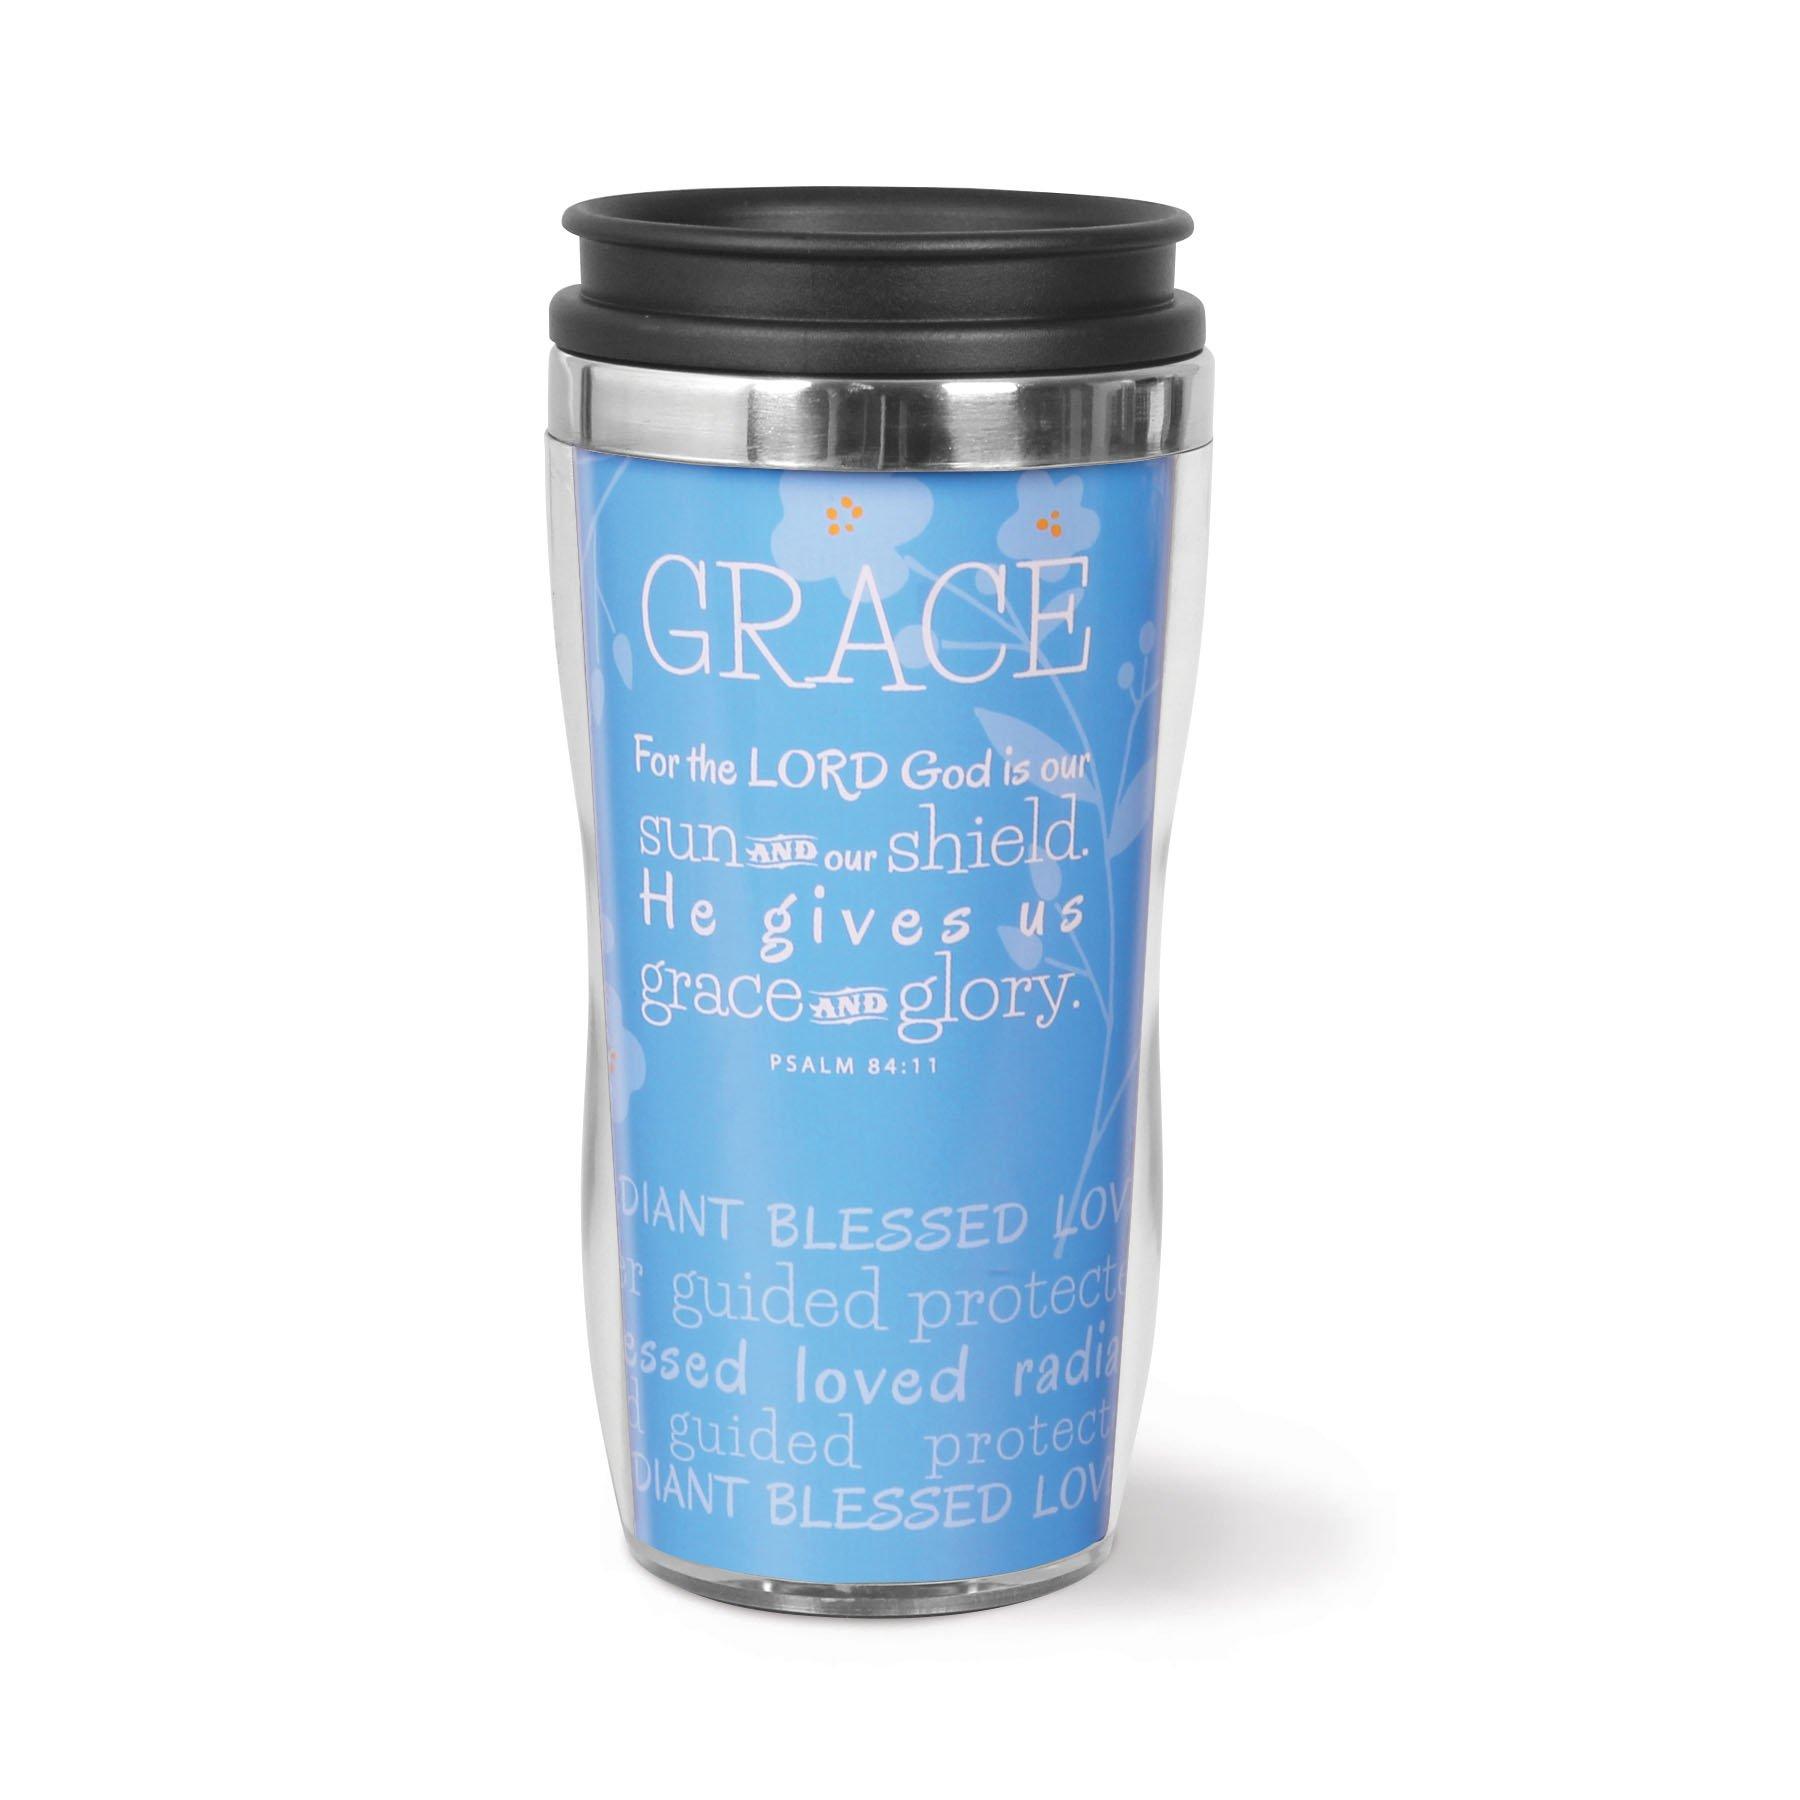 Lighthouse Christian Products Grace Wavy Acrylic/Stainless Steel Tumbler Mug, 13 oz